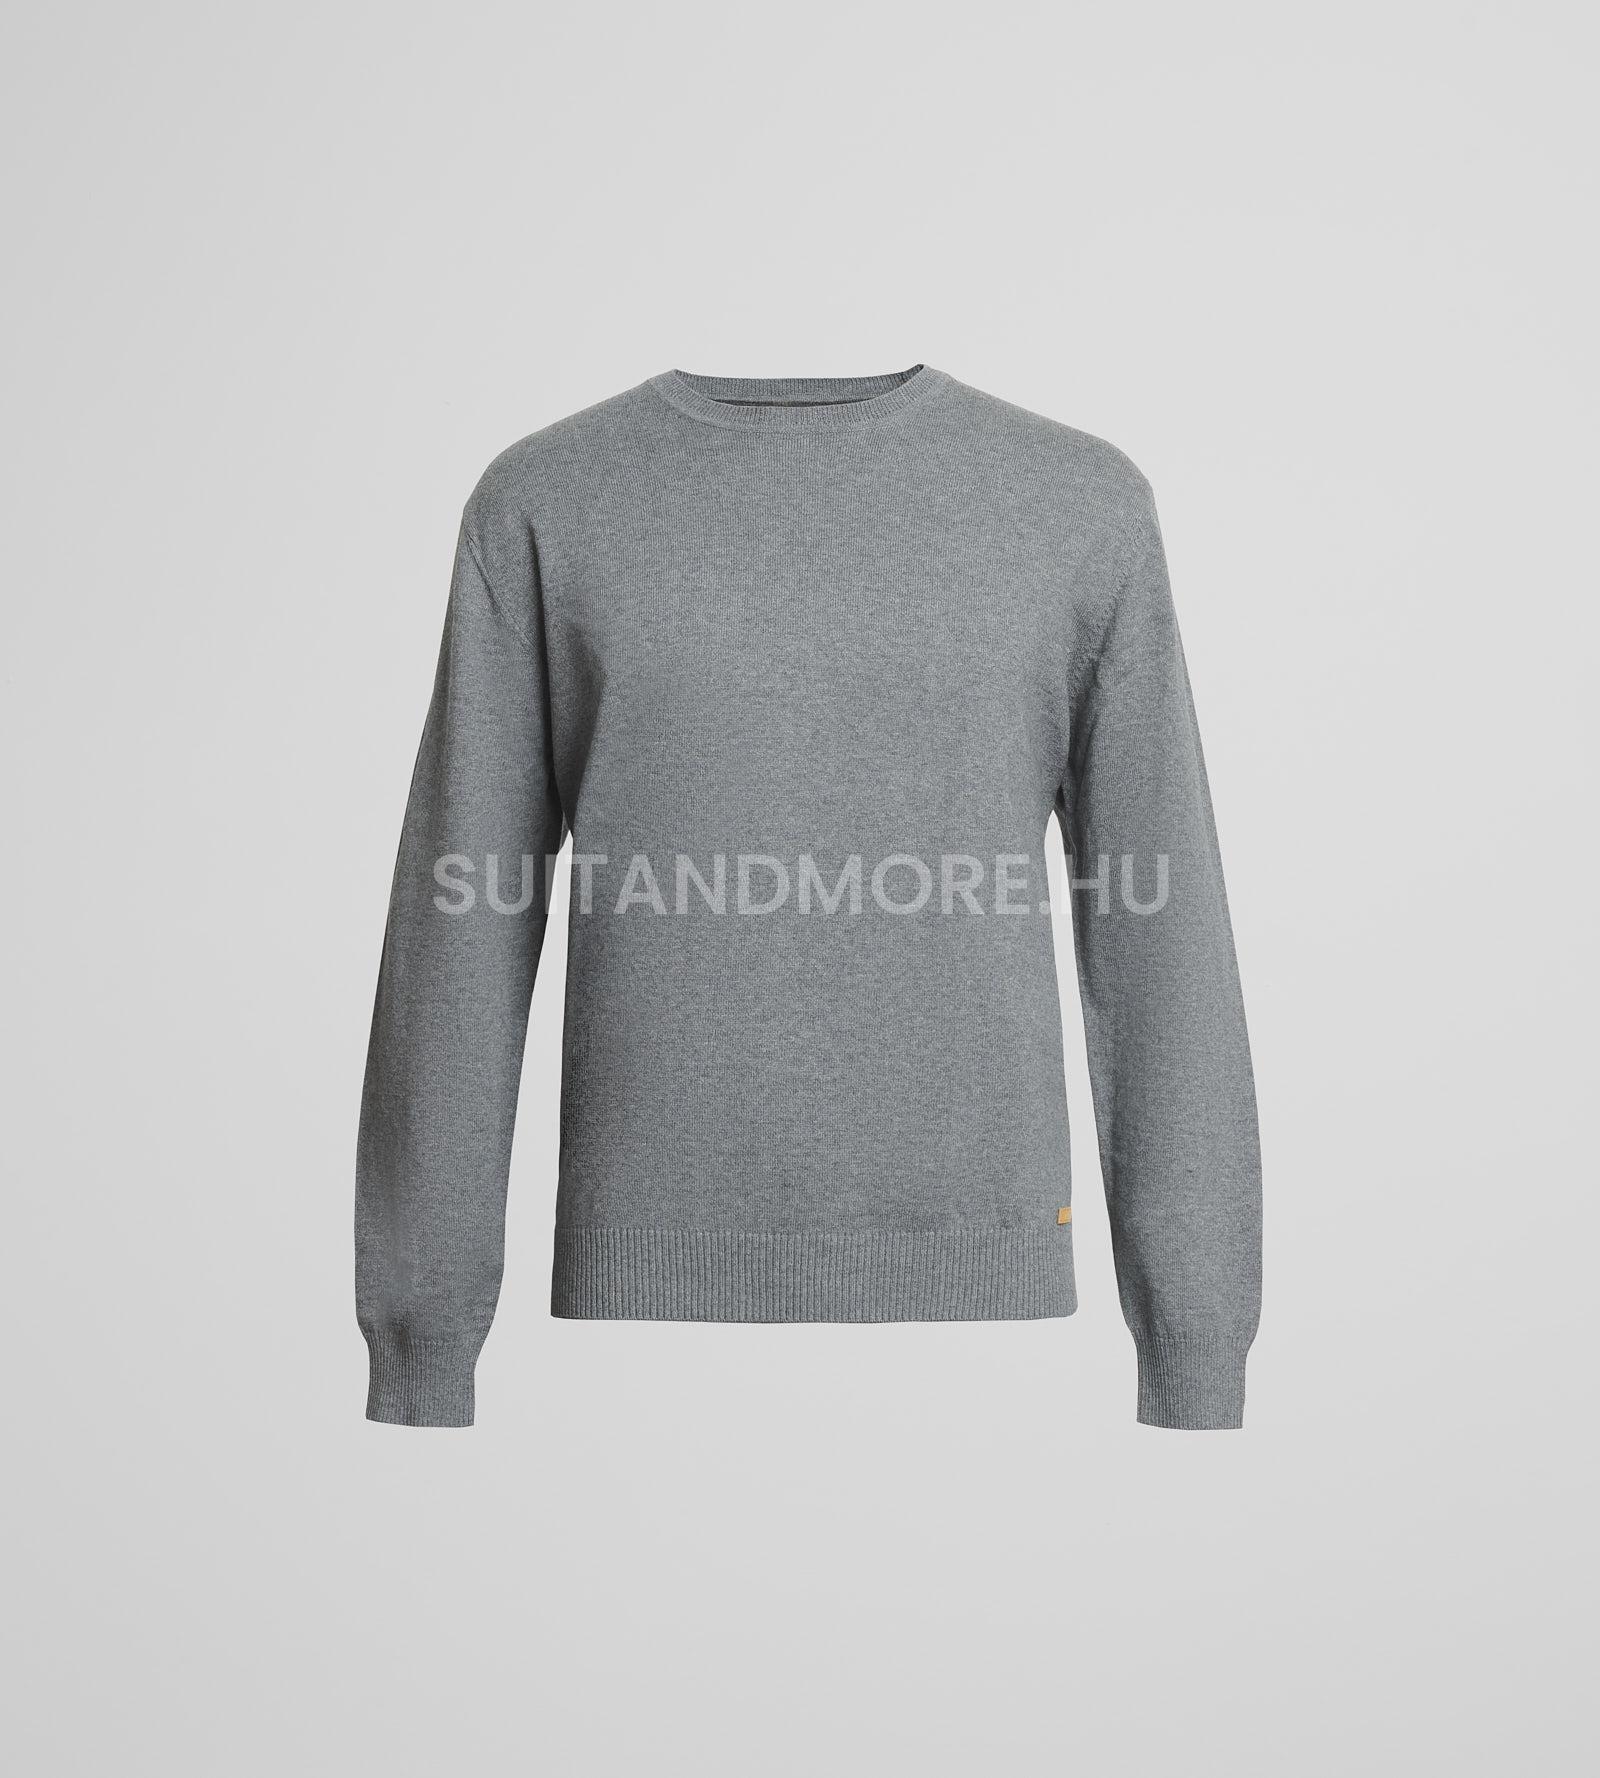 digel-kozepszurke-modern-fit-kerek-nyaku-gyapju-pulover-faros1-1-1268001-45